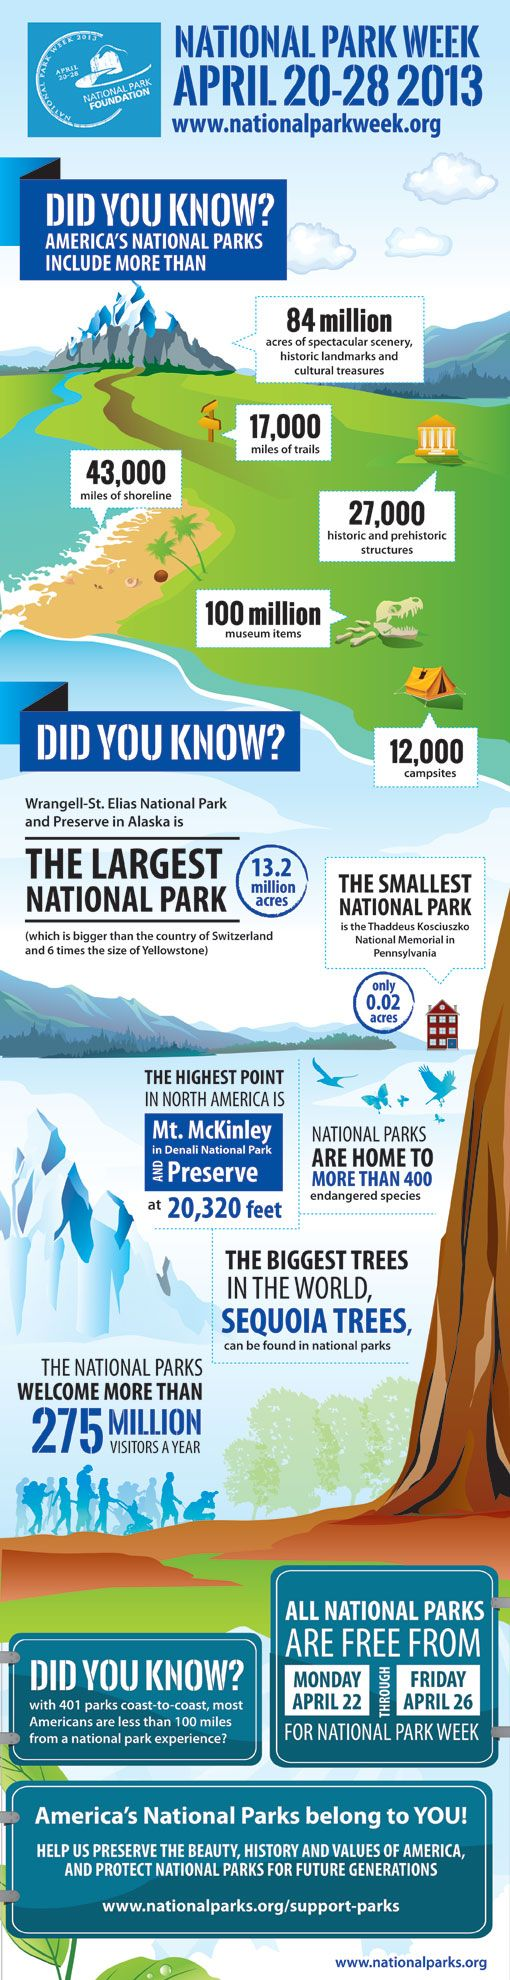 National Park Week: Free Admission 4/22-4/26